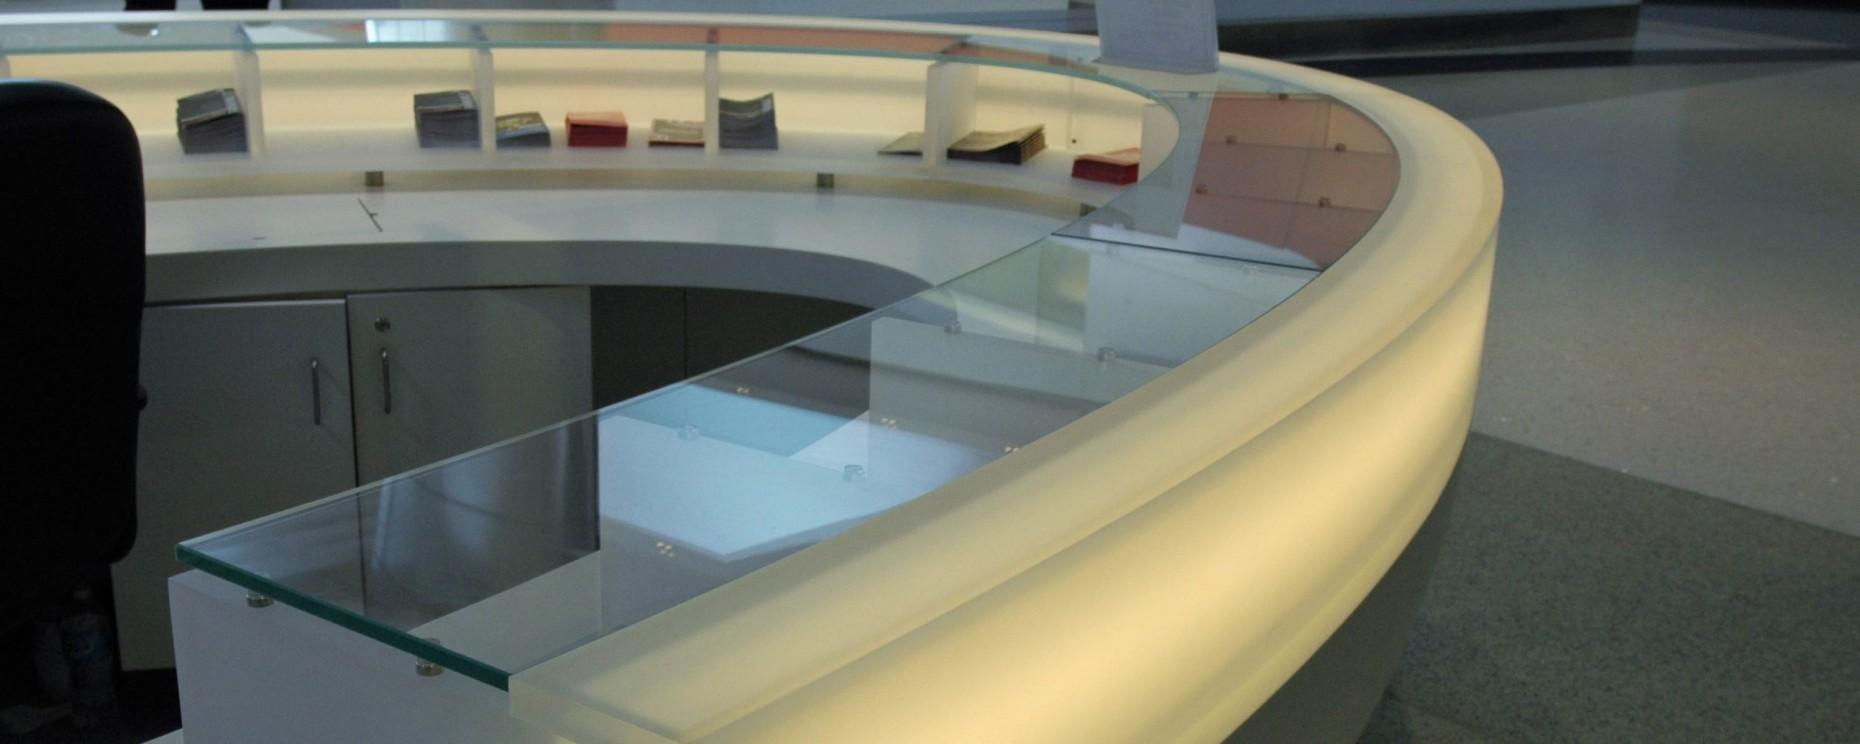 Terminal F Philadelphia International Airport. Thermoformed information desk  Materials: Corian, 3form, glass Architecture: Daroff Design General Contractor: Daniel J. Keating Construction